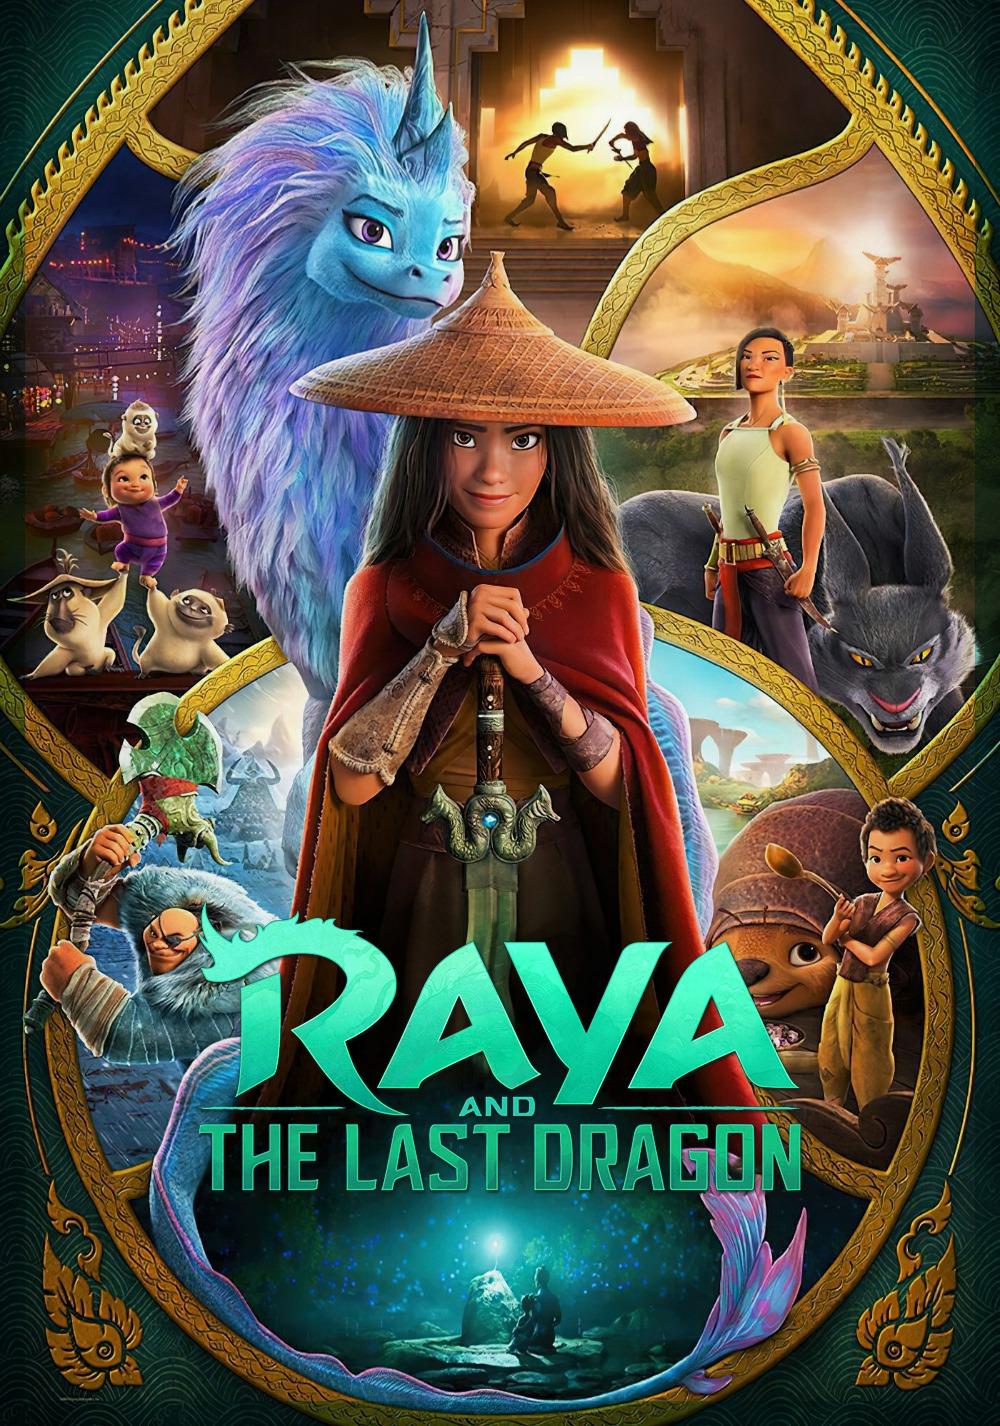 raya-and-the-last-dragon-601fc1c4dcb20